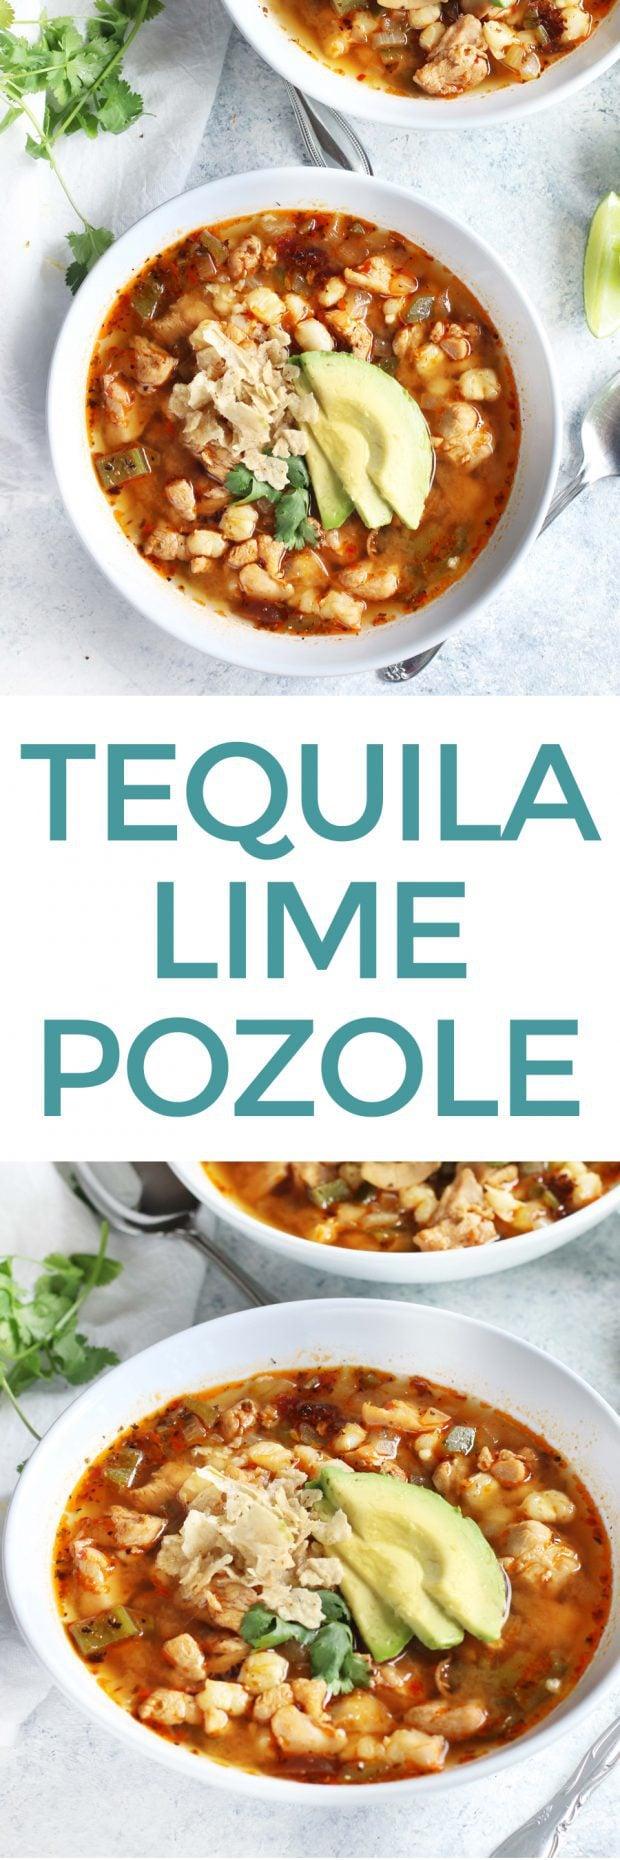 Tequila Lime Pozole